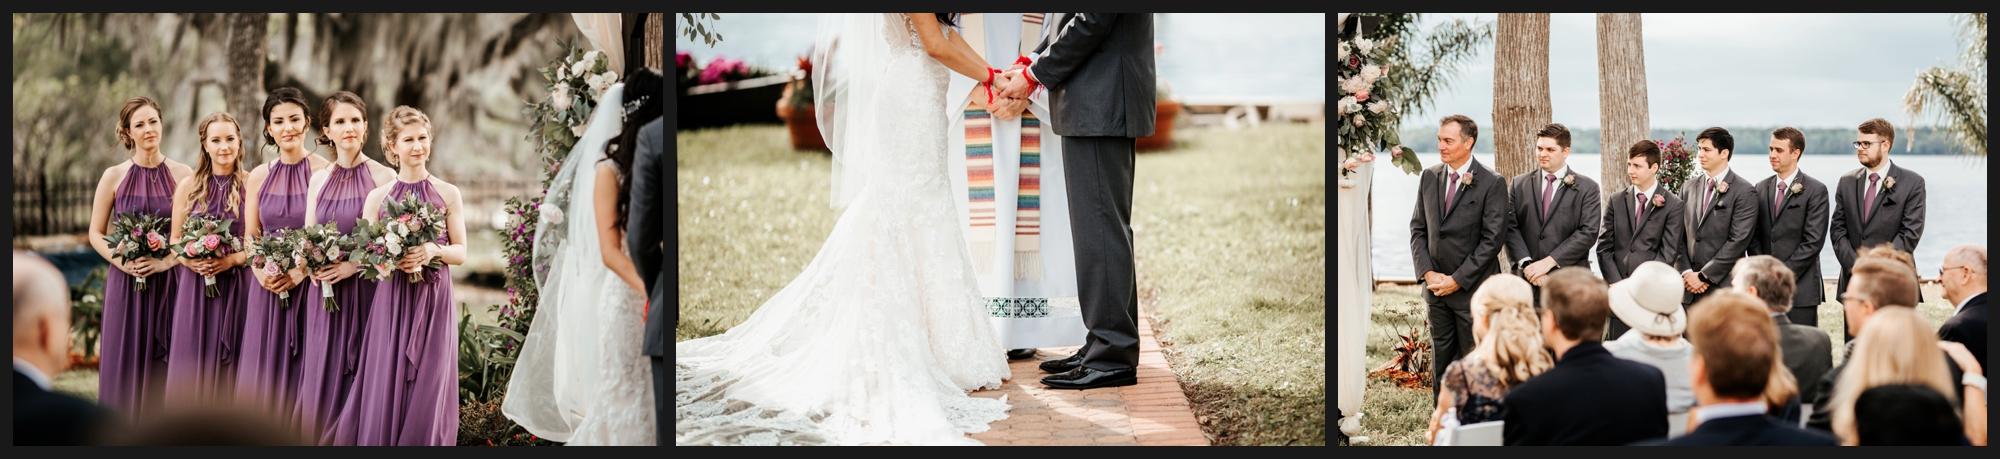 Orlando-Wedding-Photographer-destination-wedding-photographer-florida-wedding-photographer-bohemian-wedding-photographer_1357.jpg